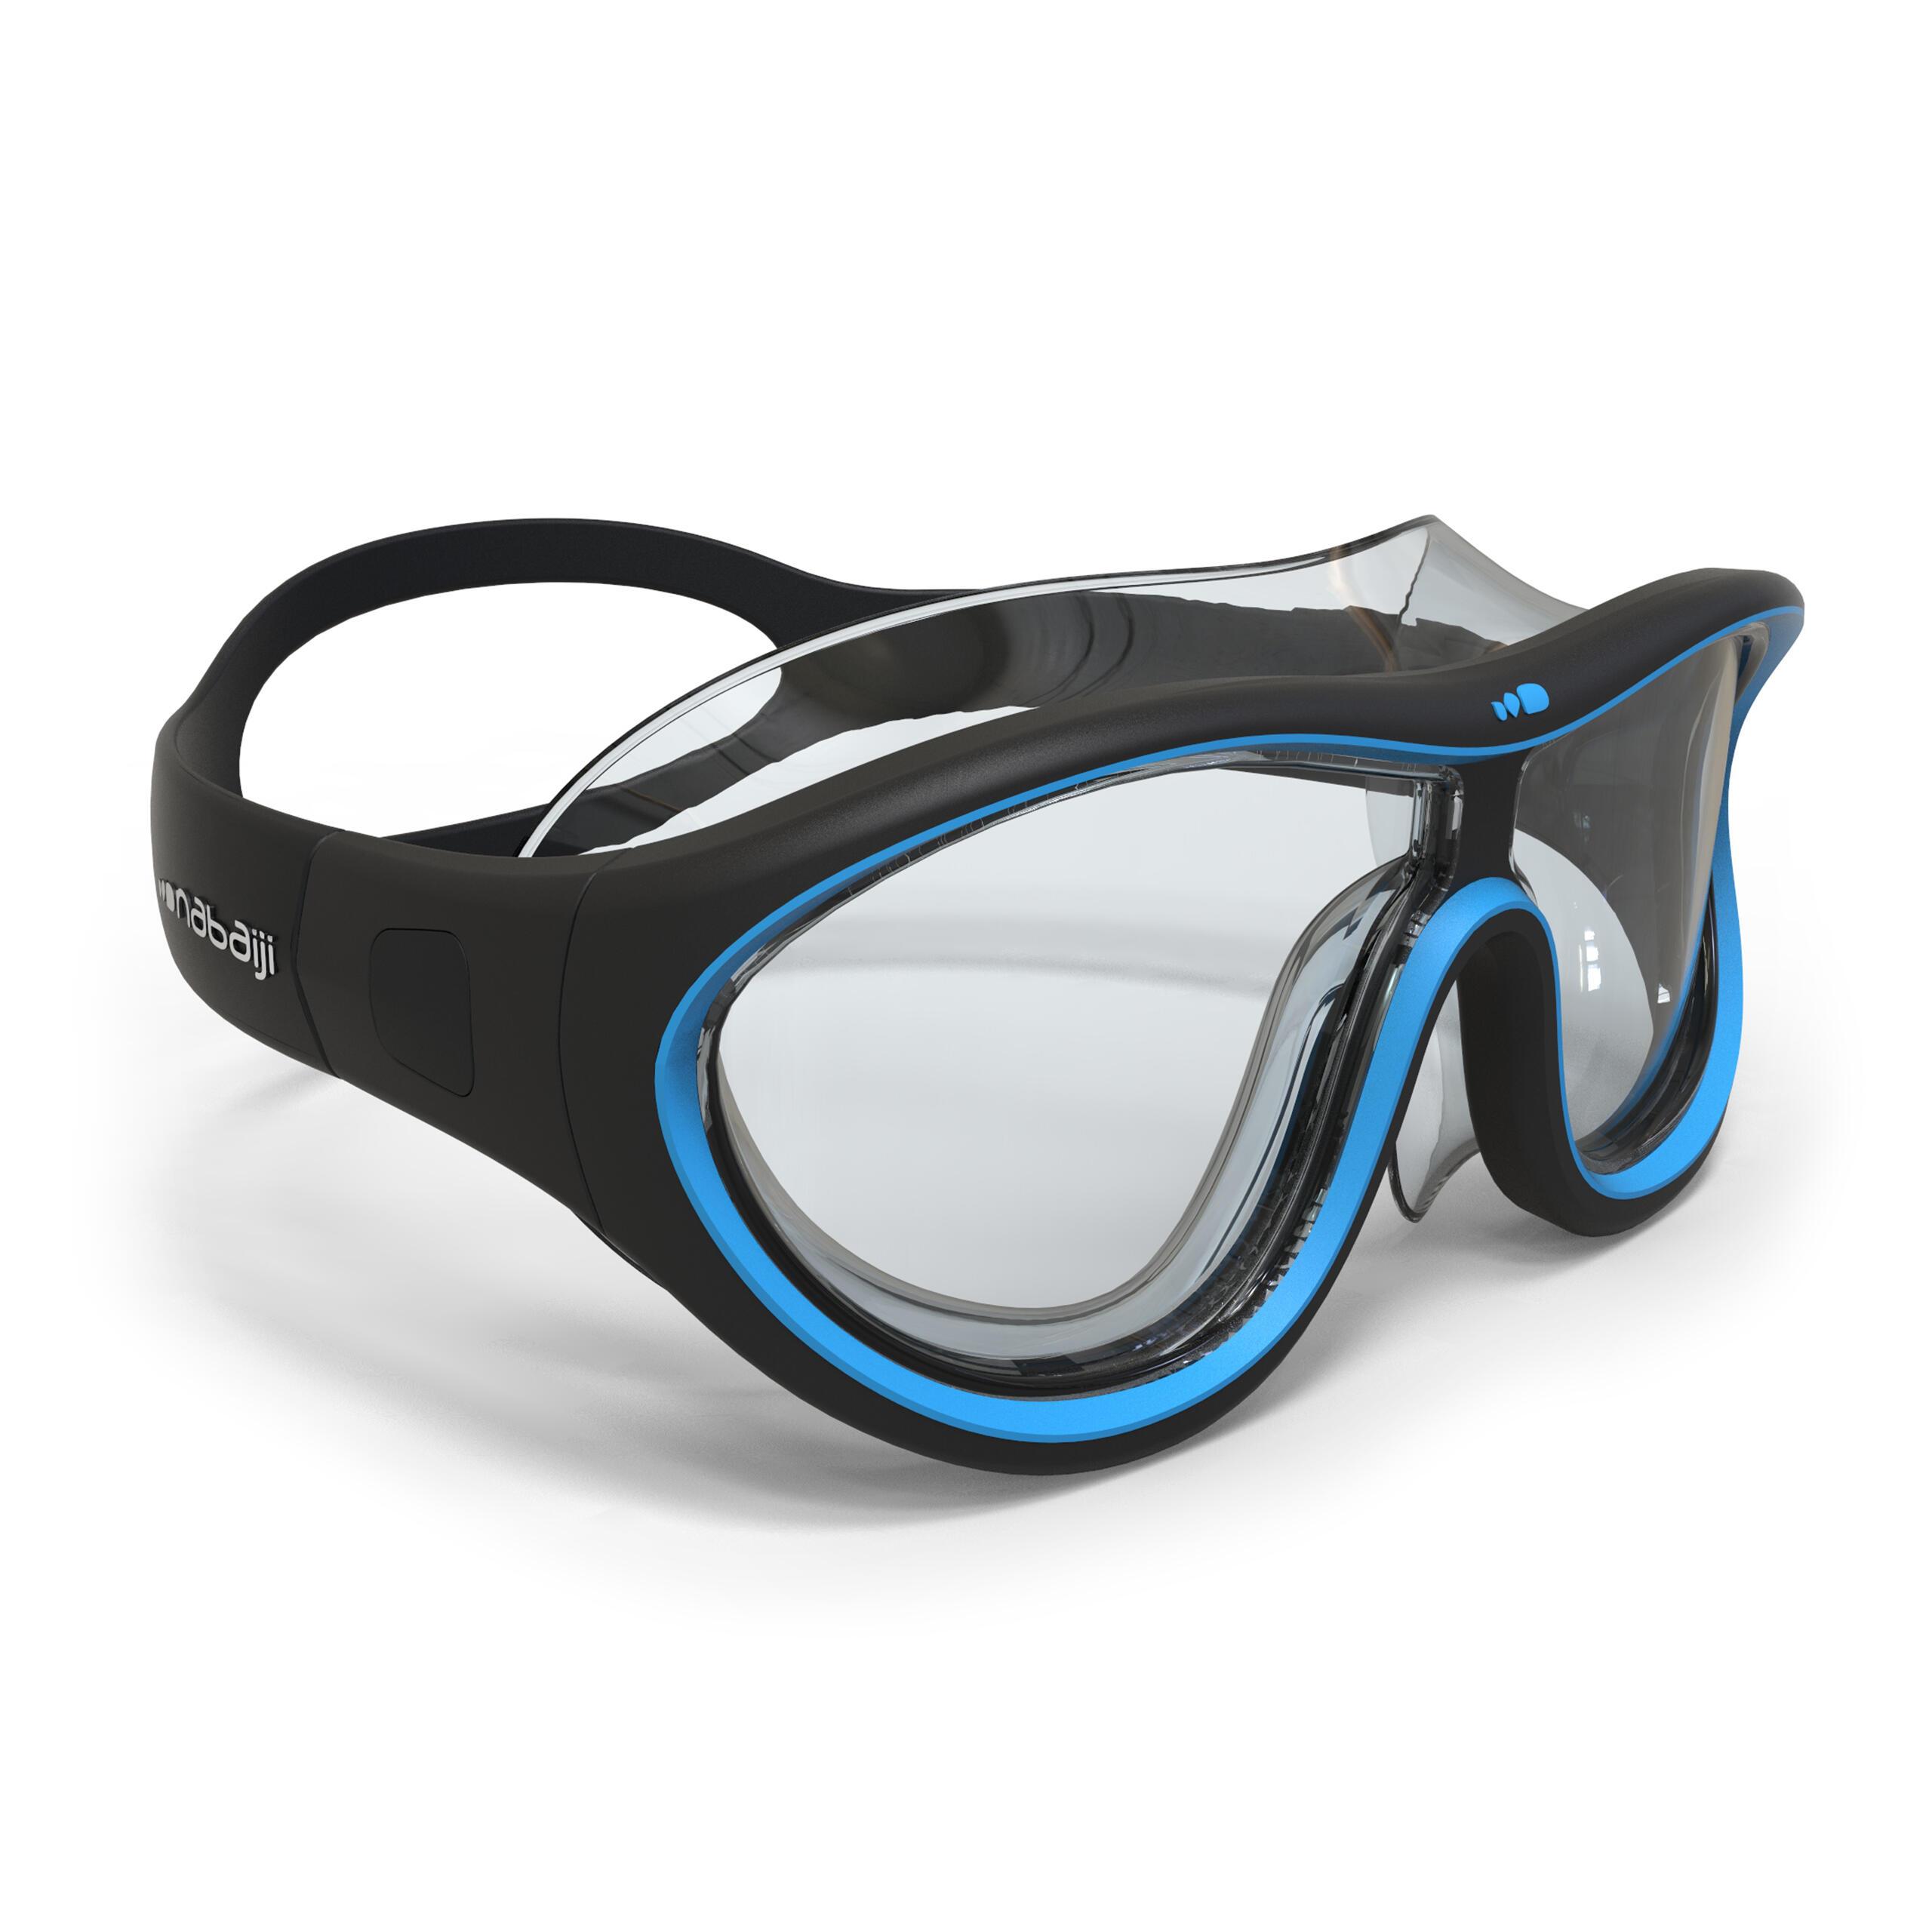 Masque de natation SWIMDOW Taille G Noir bleu